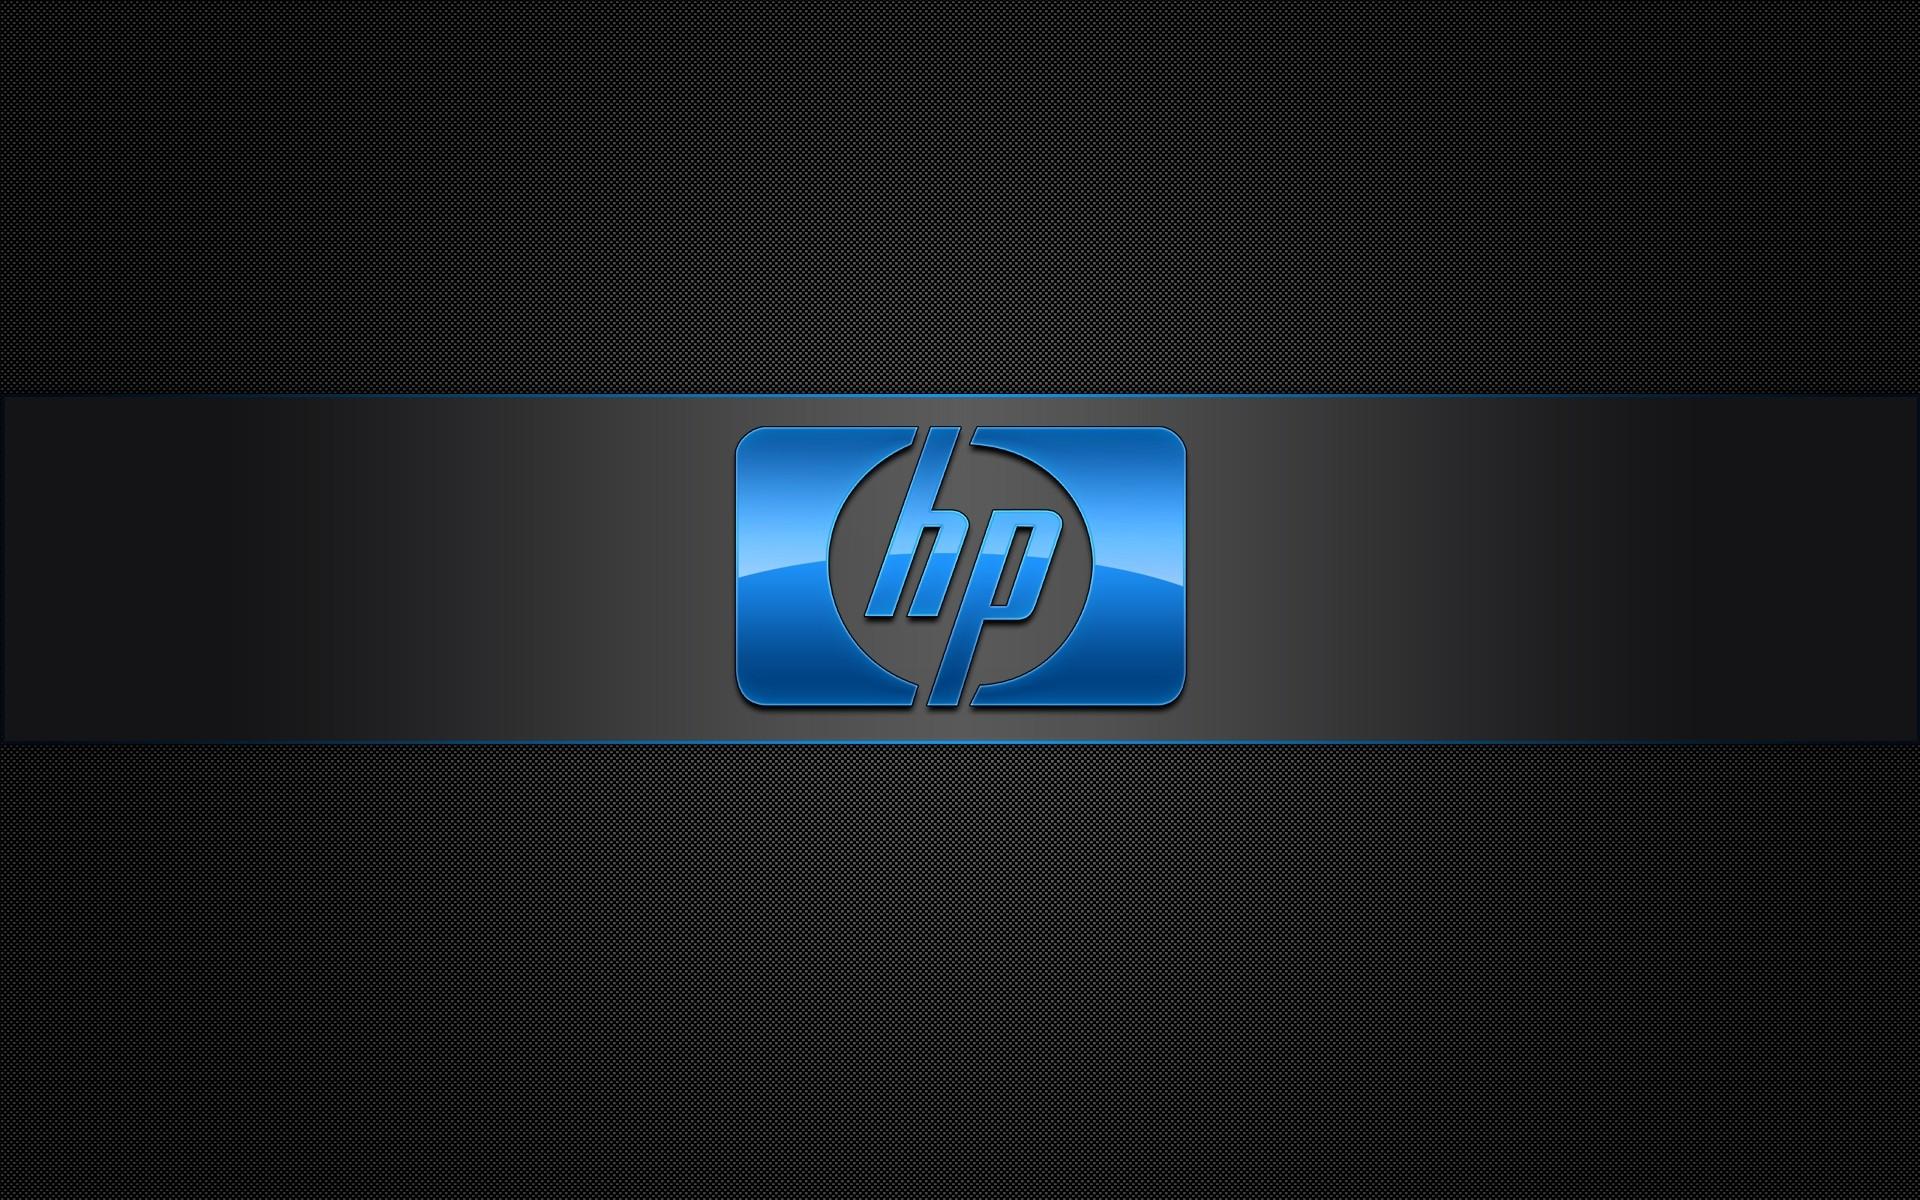 HP Spectre Wallpaper (64+ images)